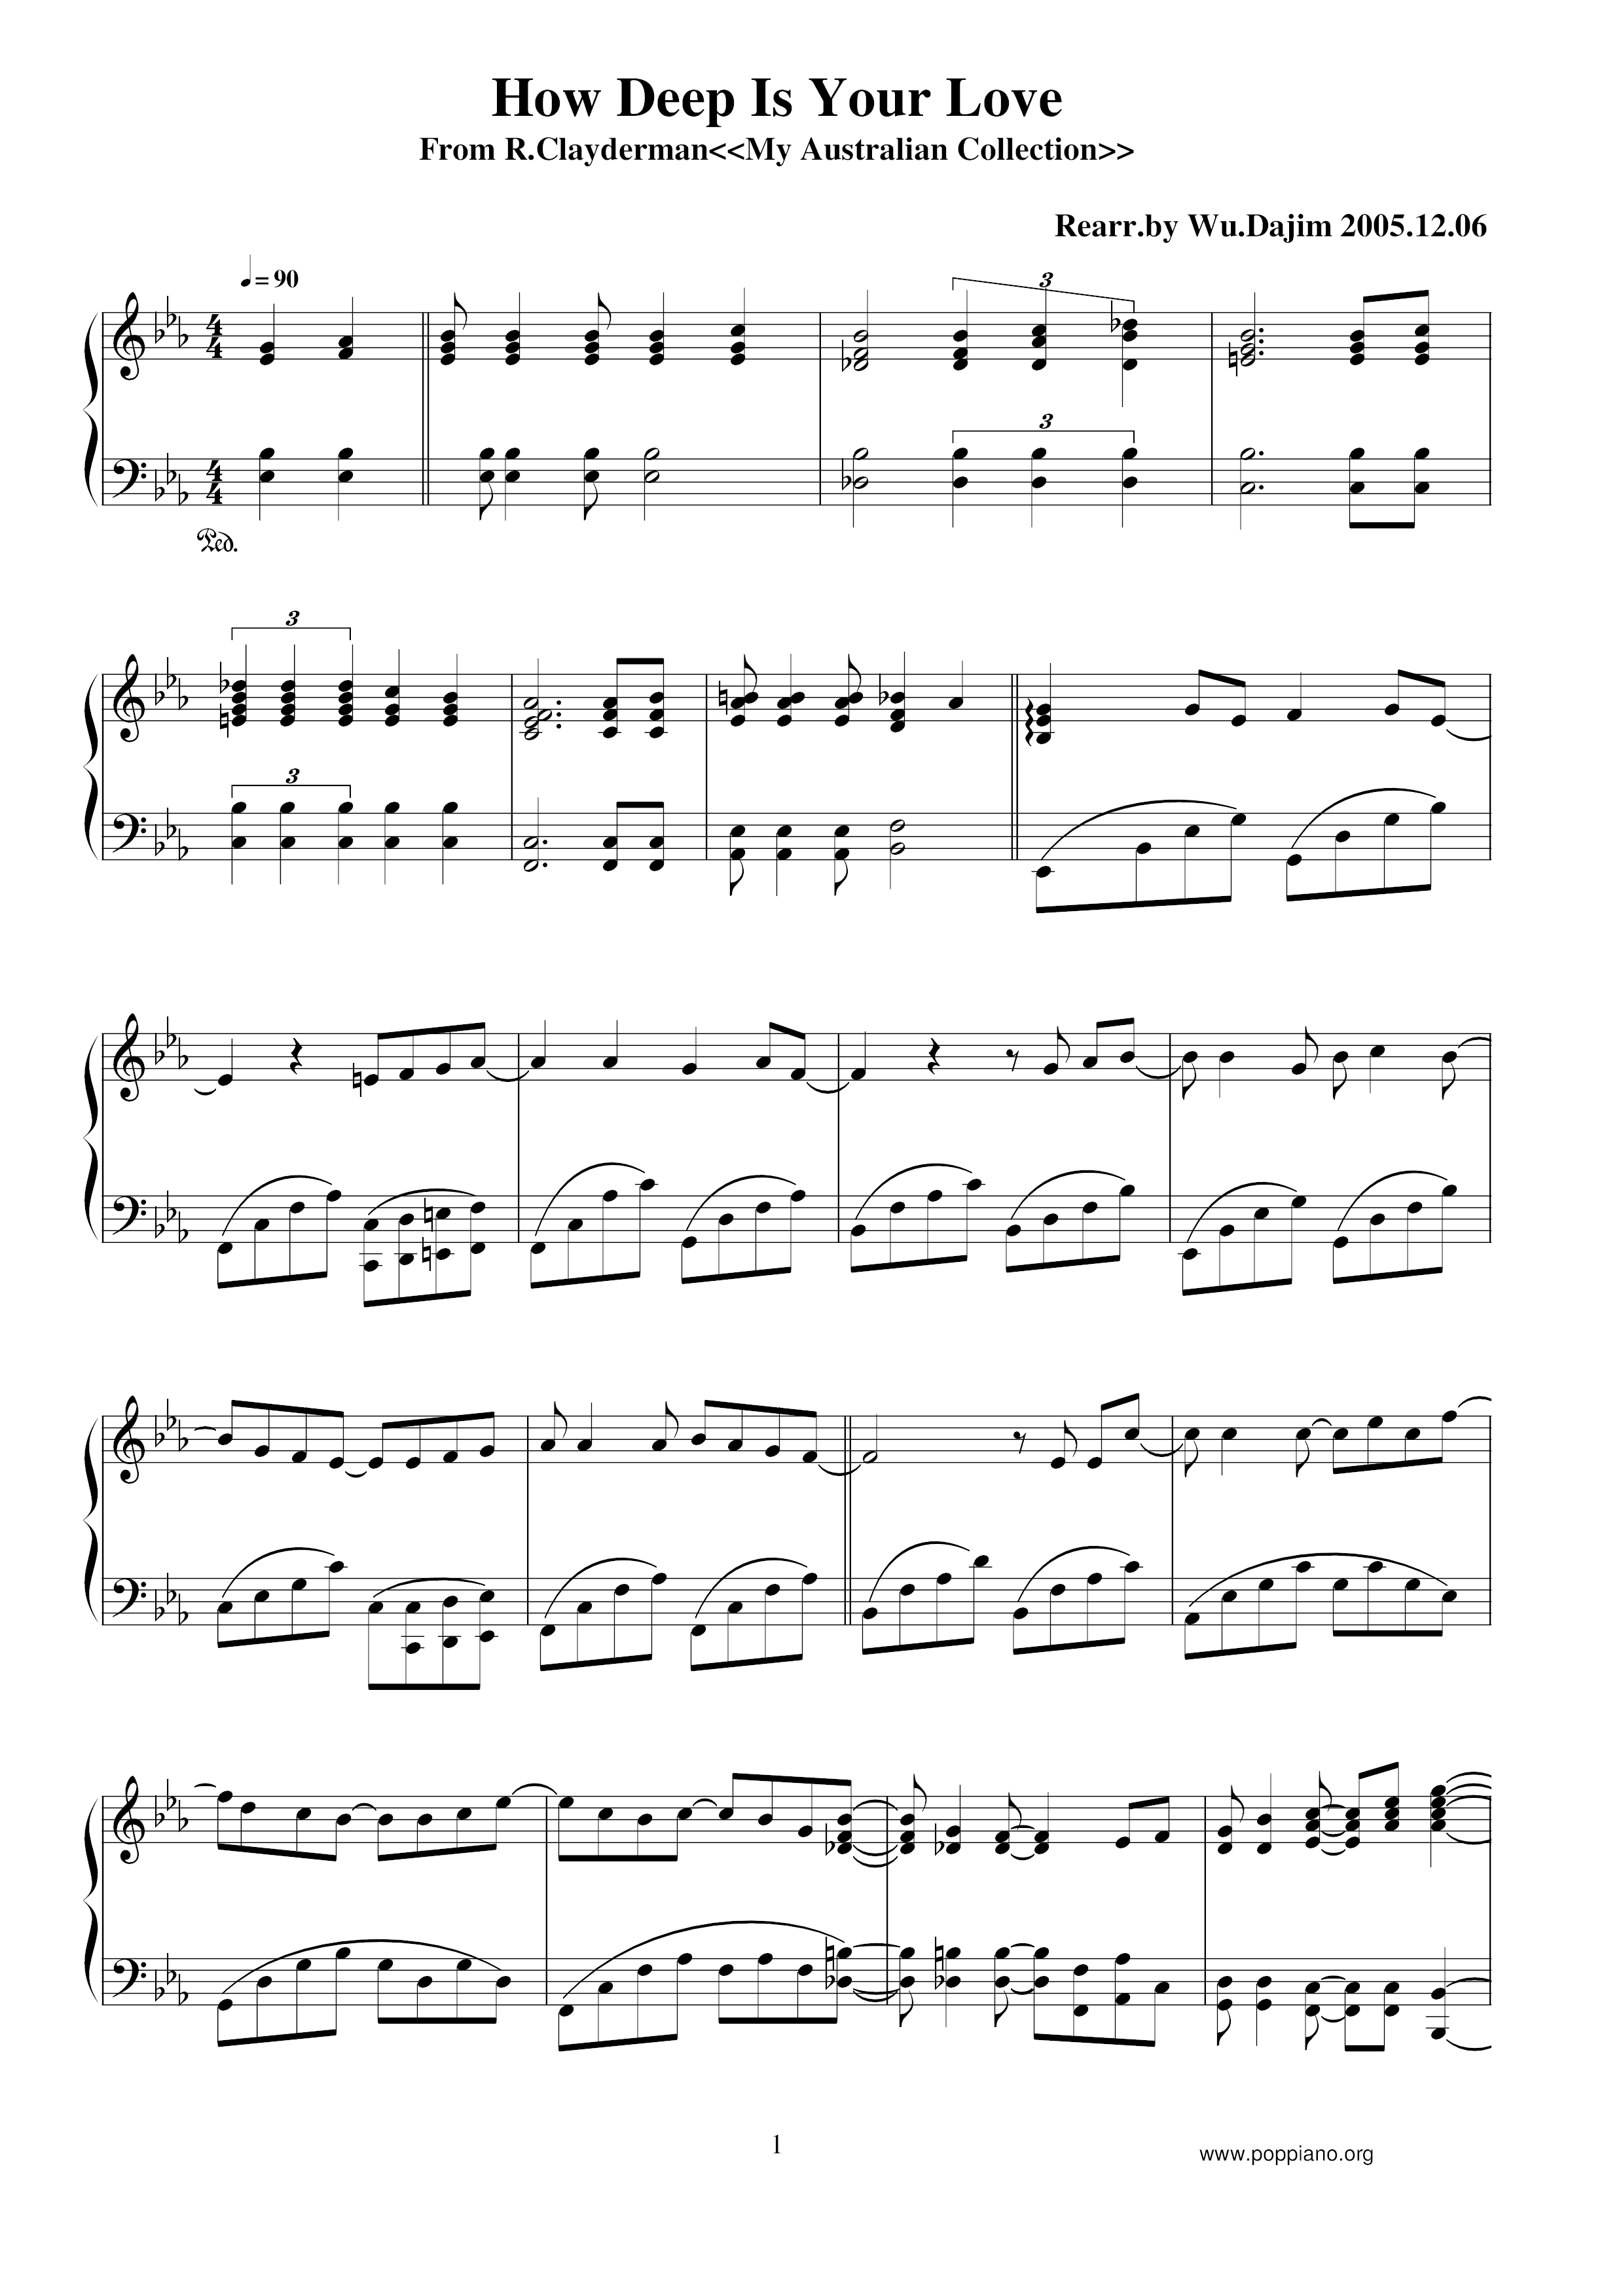 Richard Clayderman How Deep Is Your Love Sheet Music Pdf Free Score Download